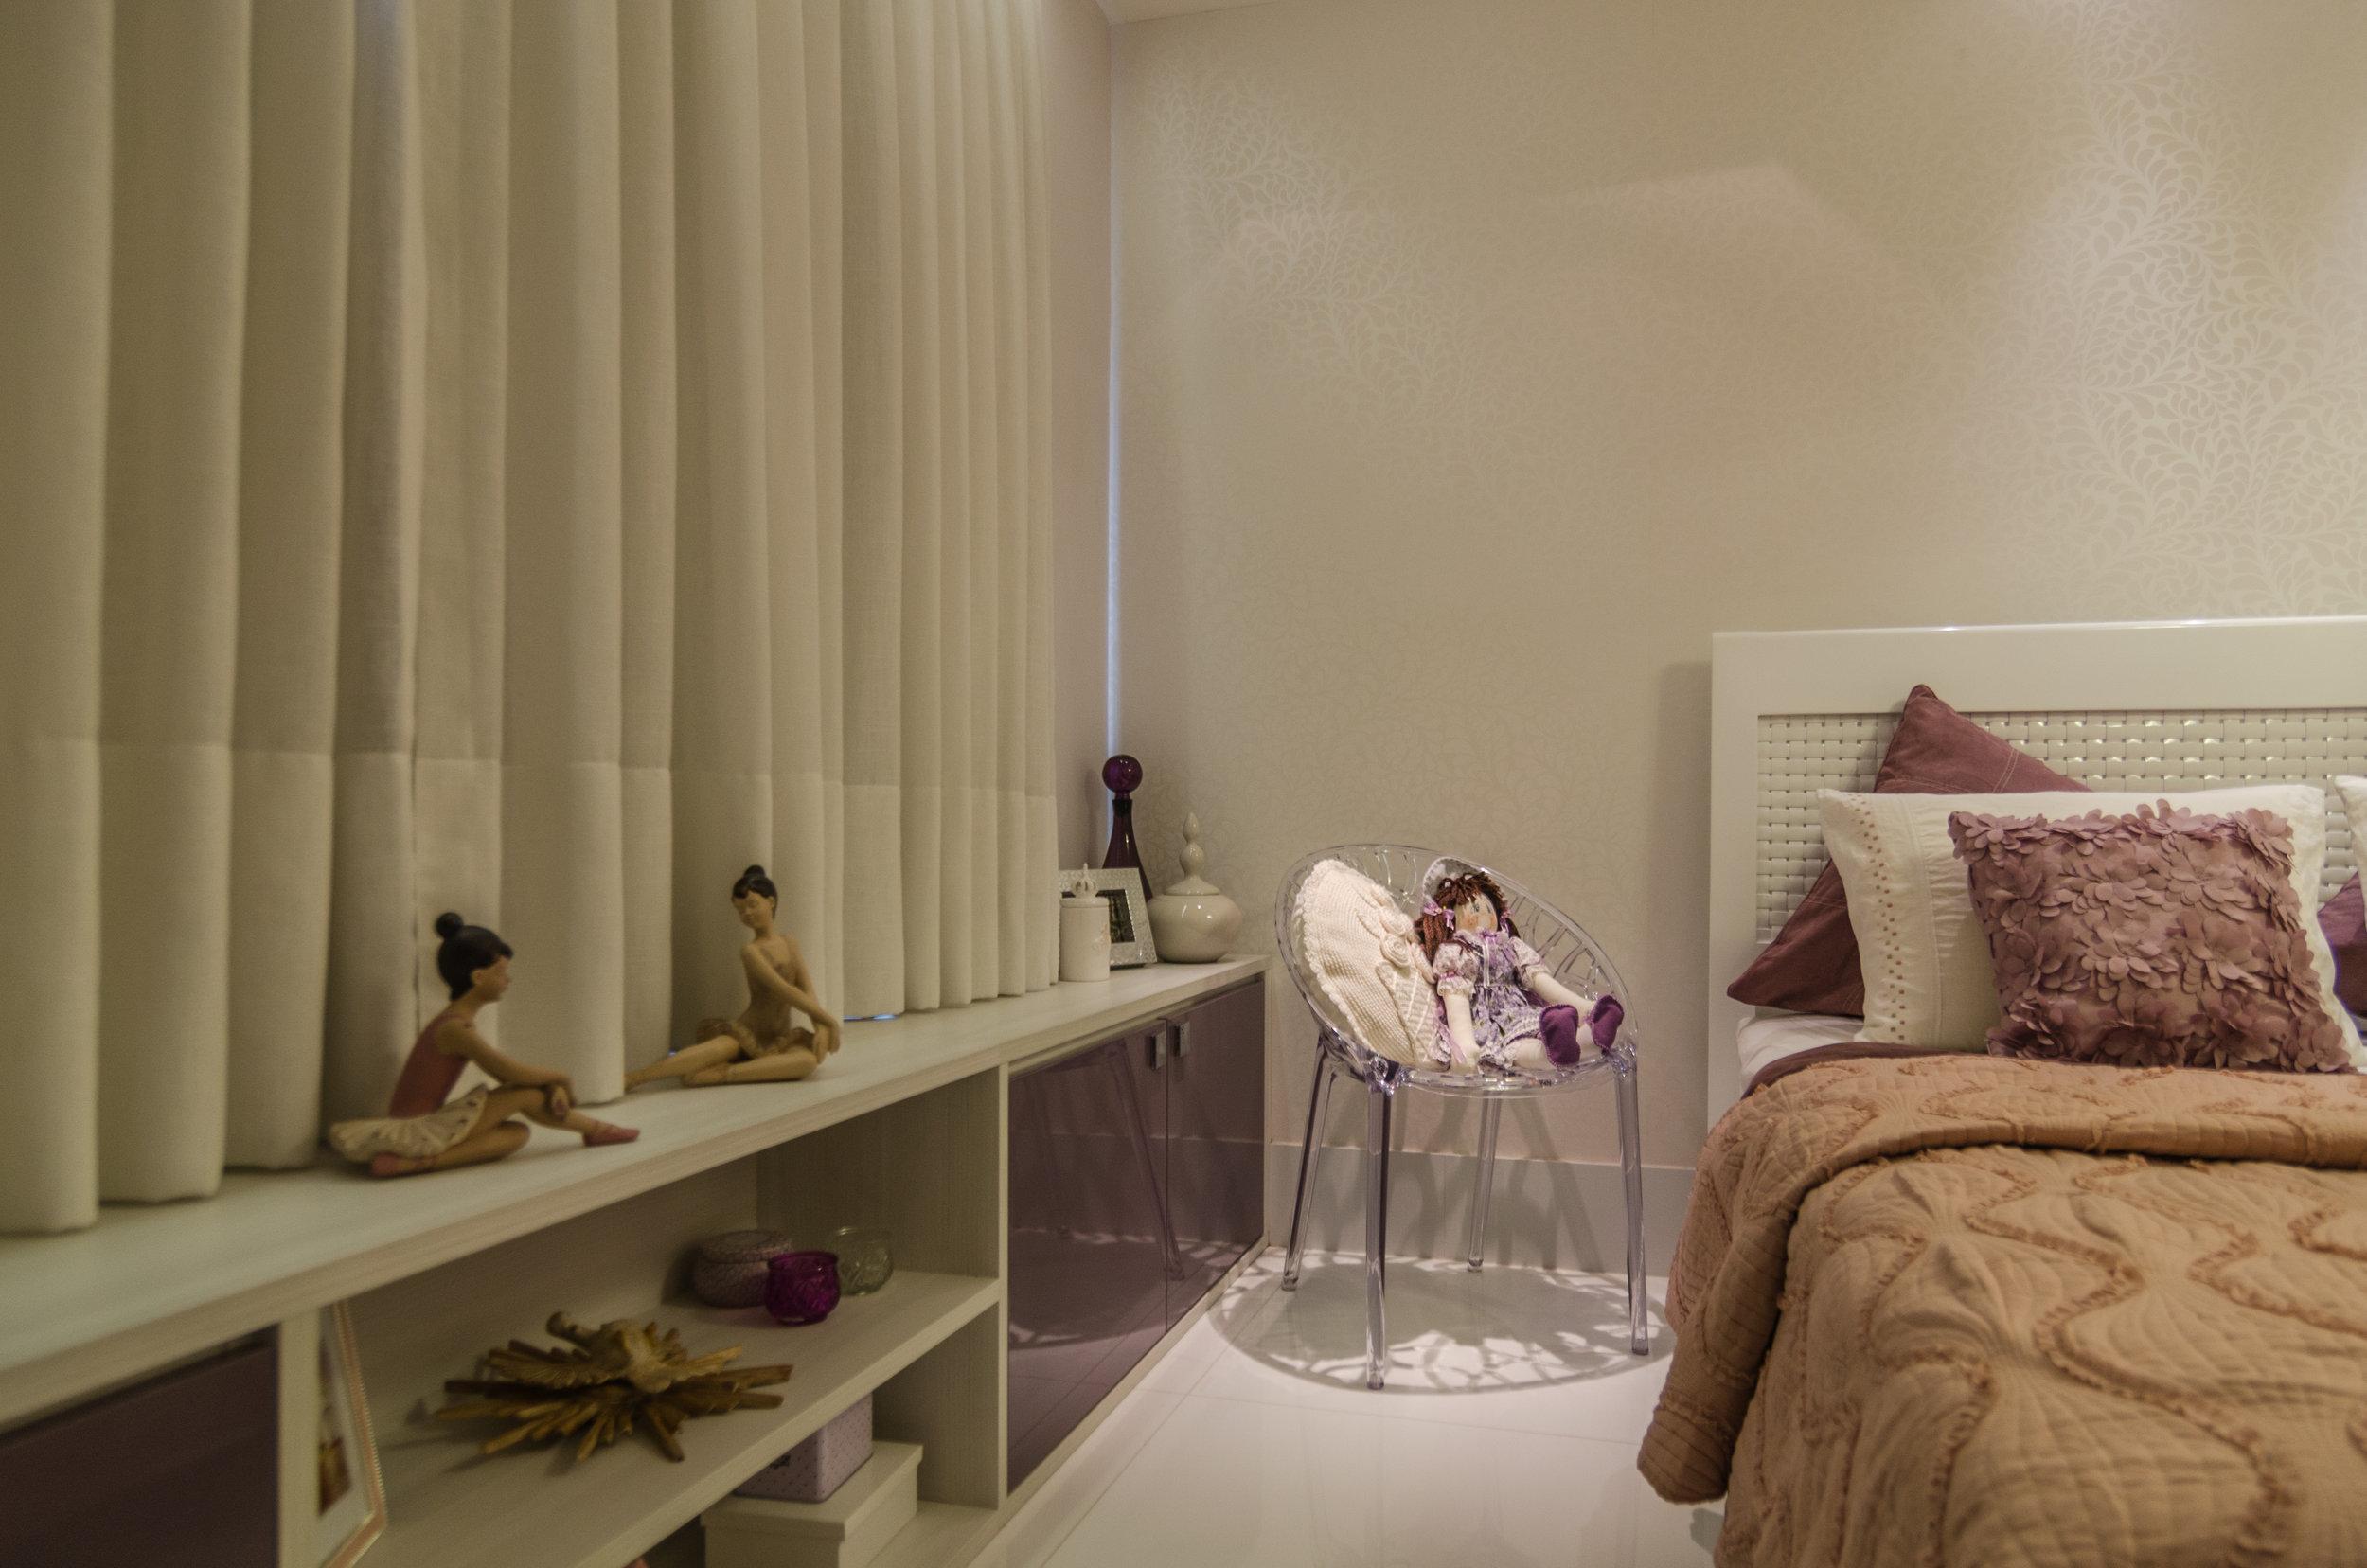 projeto-arquitetonico-alexandrepinto-duo-arquitetura-casa-06.jpg